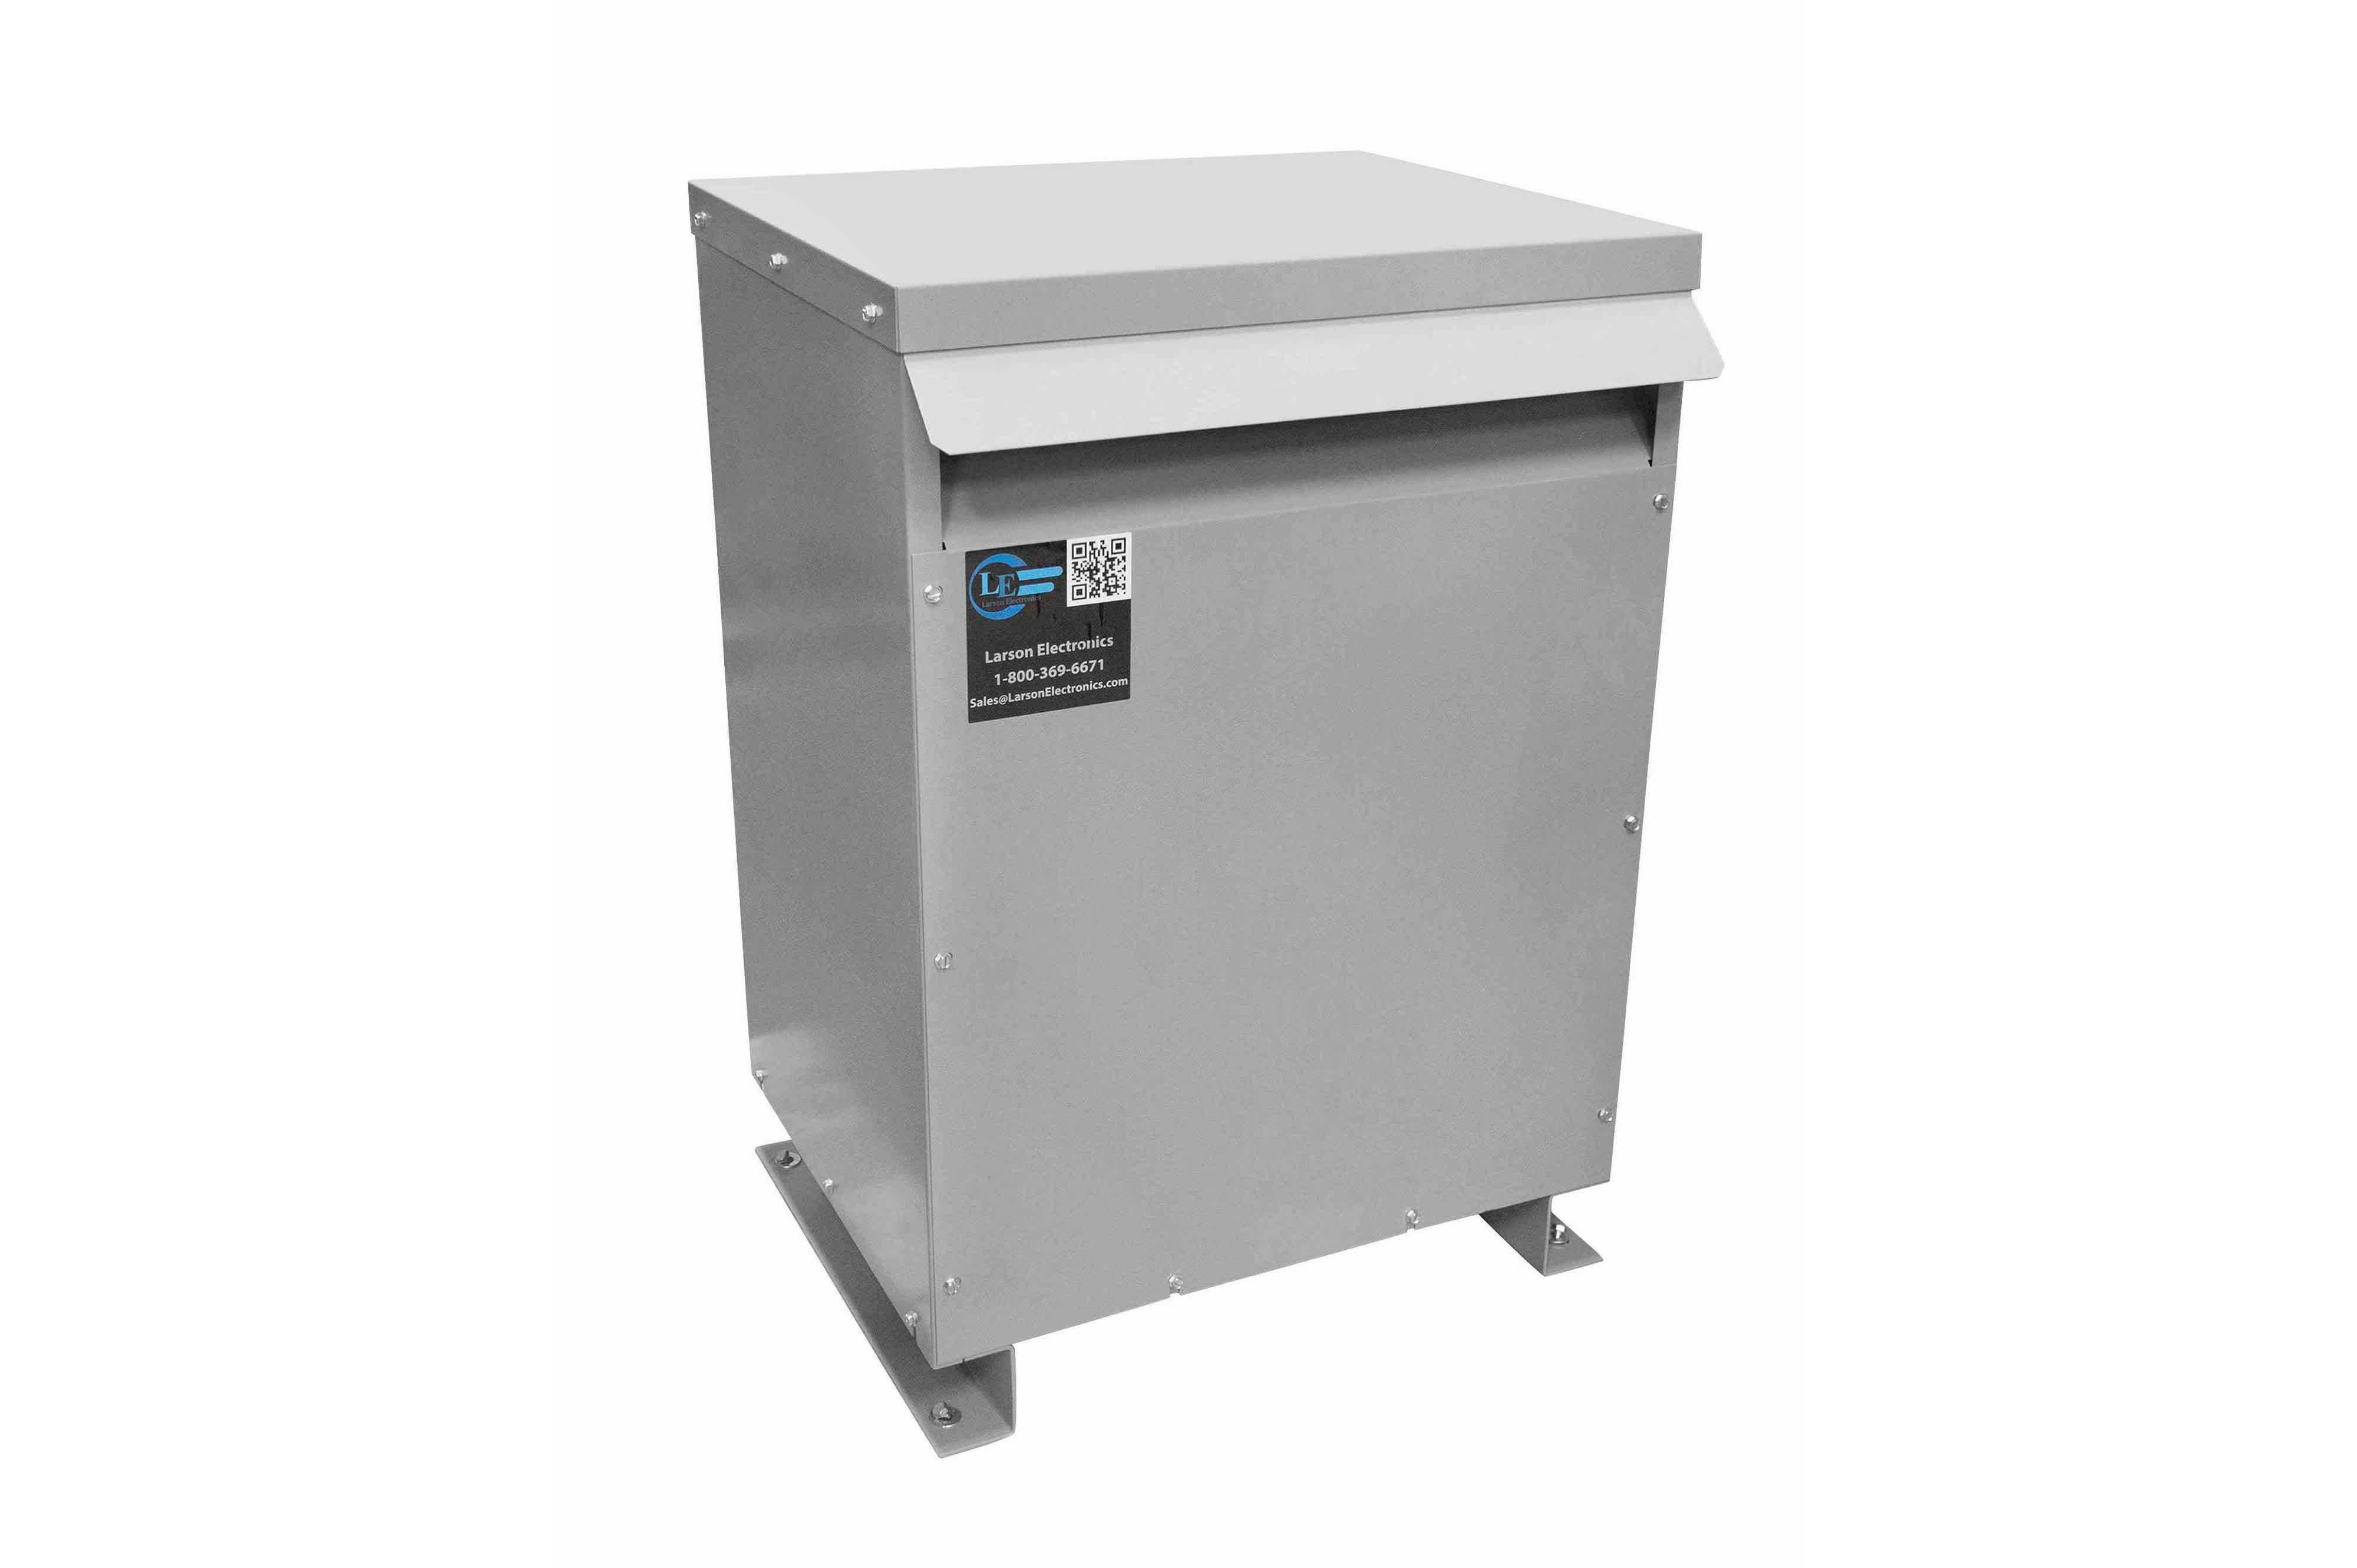 37.5 kVA 3PH DOE Transformer, 380V Delta Primary, 480Y/277 Wye-N Secondary, N3R, Ventilated, 60 Hz